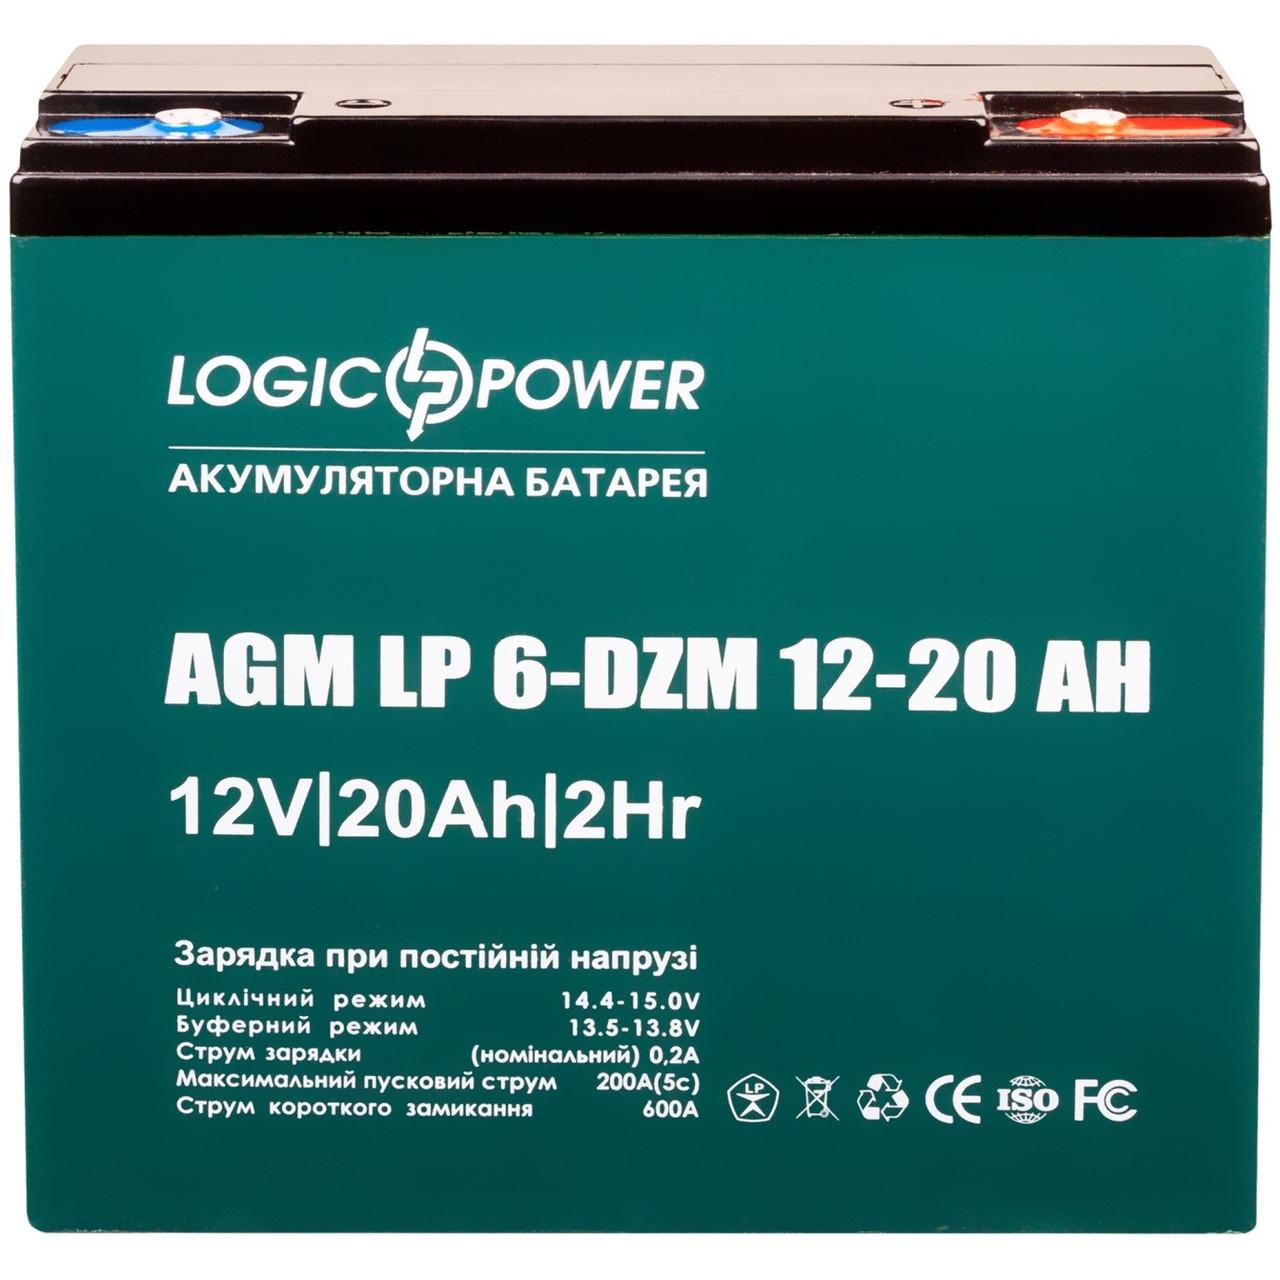 Аккумуляторная батарея LogicPower LP 6-DZM-12-20, AGM свинцово-кислотный, аккумулятор LP5438, акумулятор Лоджик Пауэр лп5438 лп lp 5438